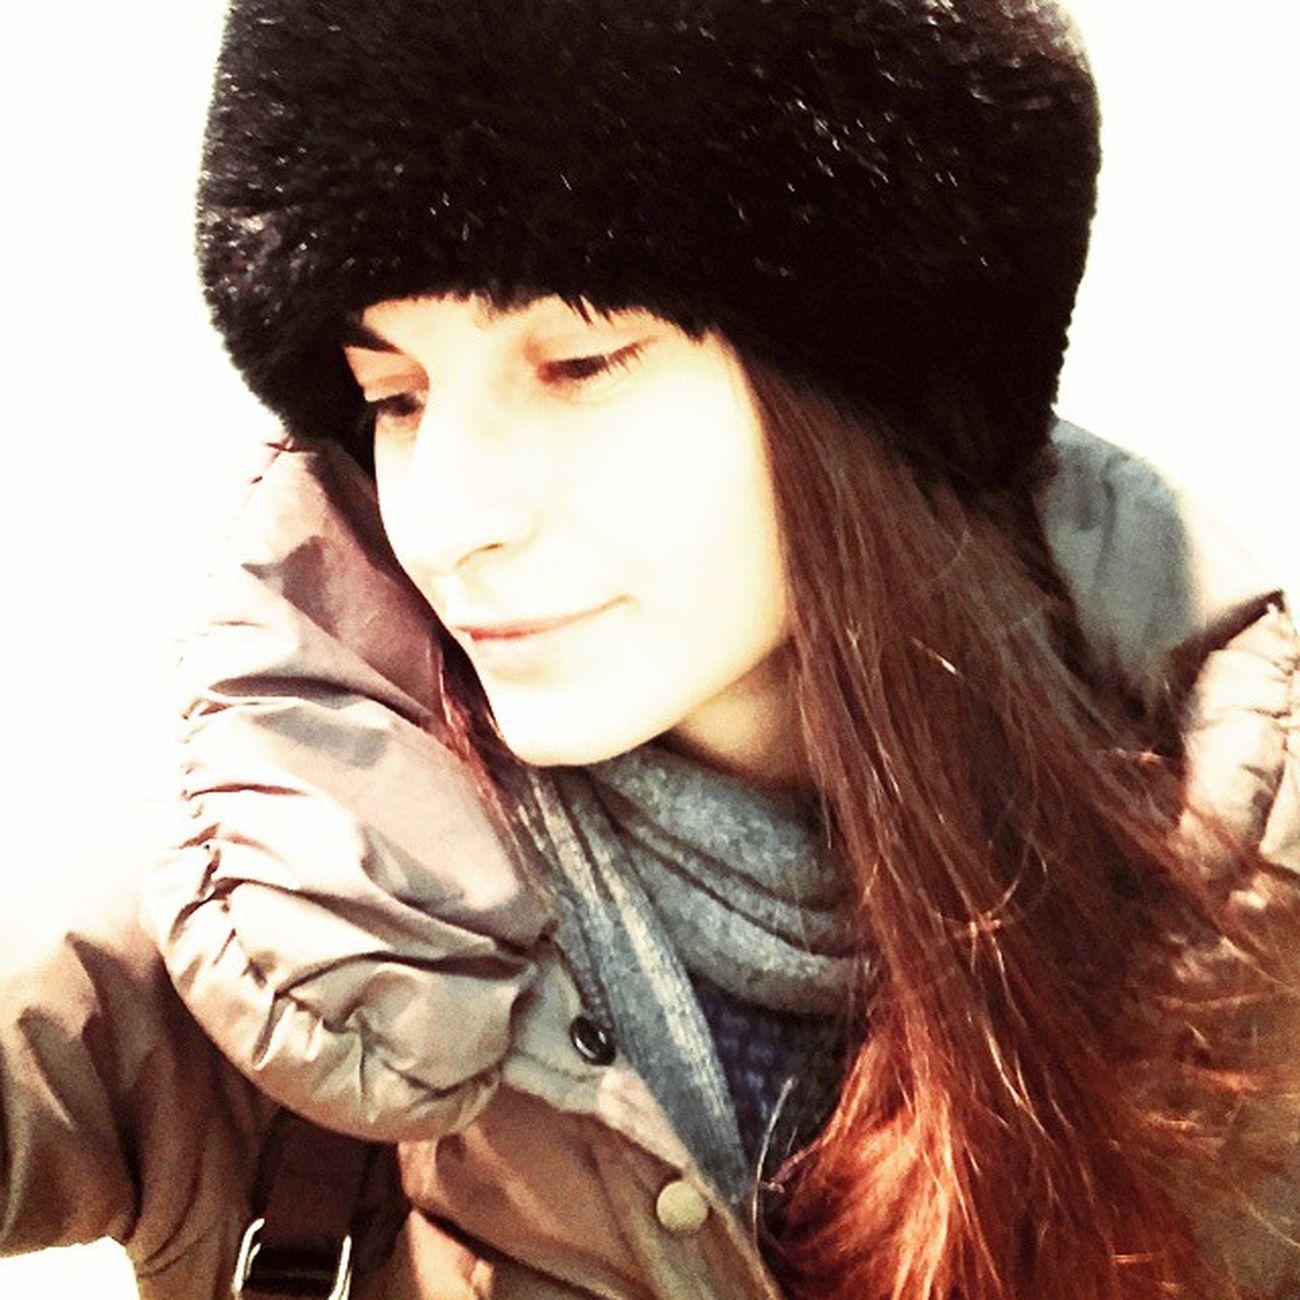 Friday mood🐧 Friday Fridaymood Selfie Selfieexpert Fridayevening BeautifulHair Beautifulwoman Beautifulpeople Krasiviepeople пятница  пятничноенастроение пятничныйвечер нечегоделать дурашка смешноефото Funnyphoto похожанапингвина пингвин Penguin Likepenguin